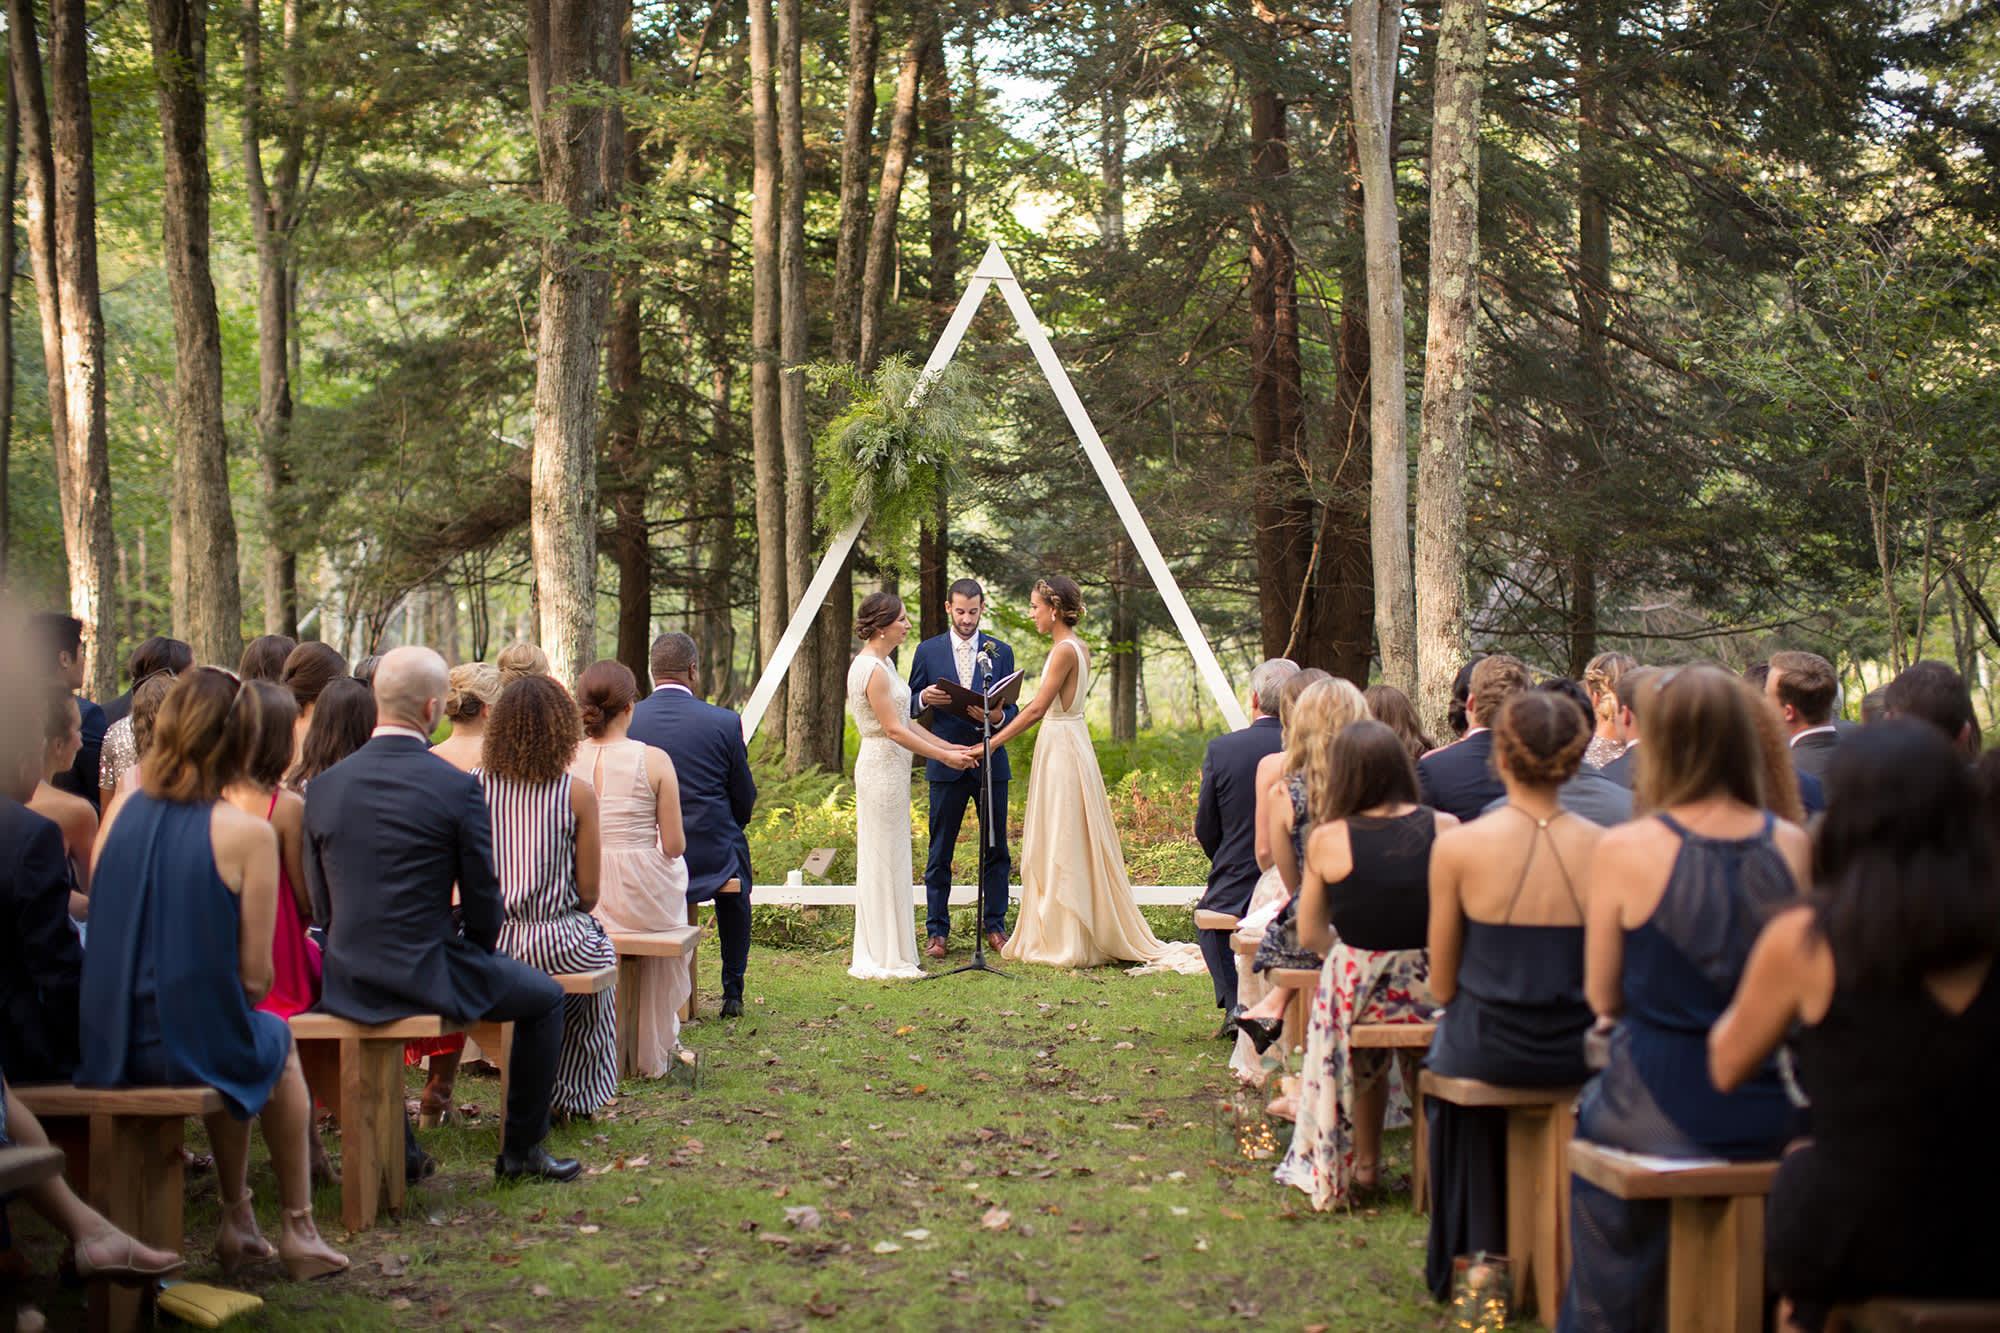 Offbeat Wedding Venues Can Help Trim Your Wedding Budget